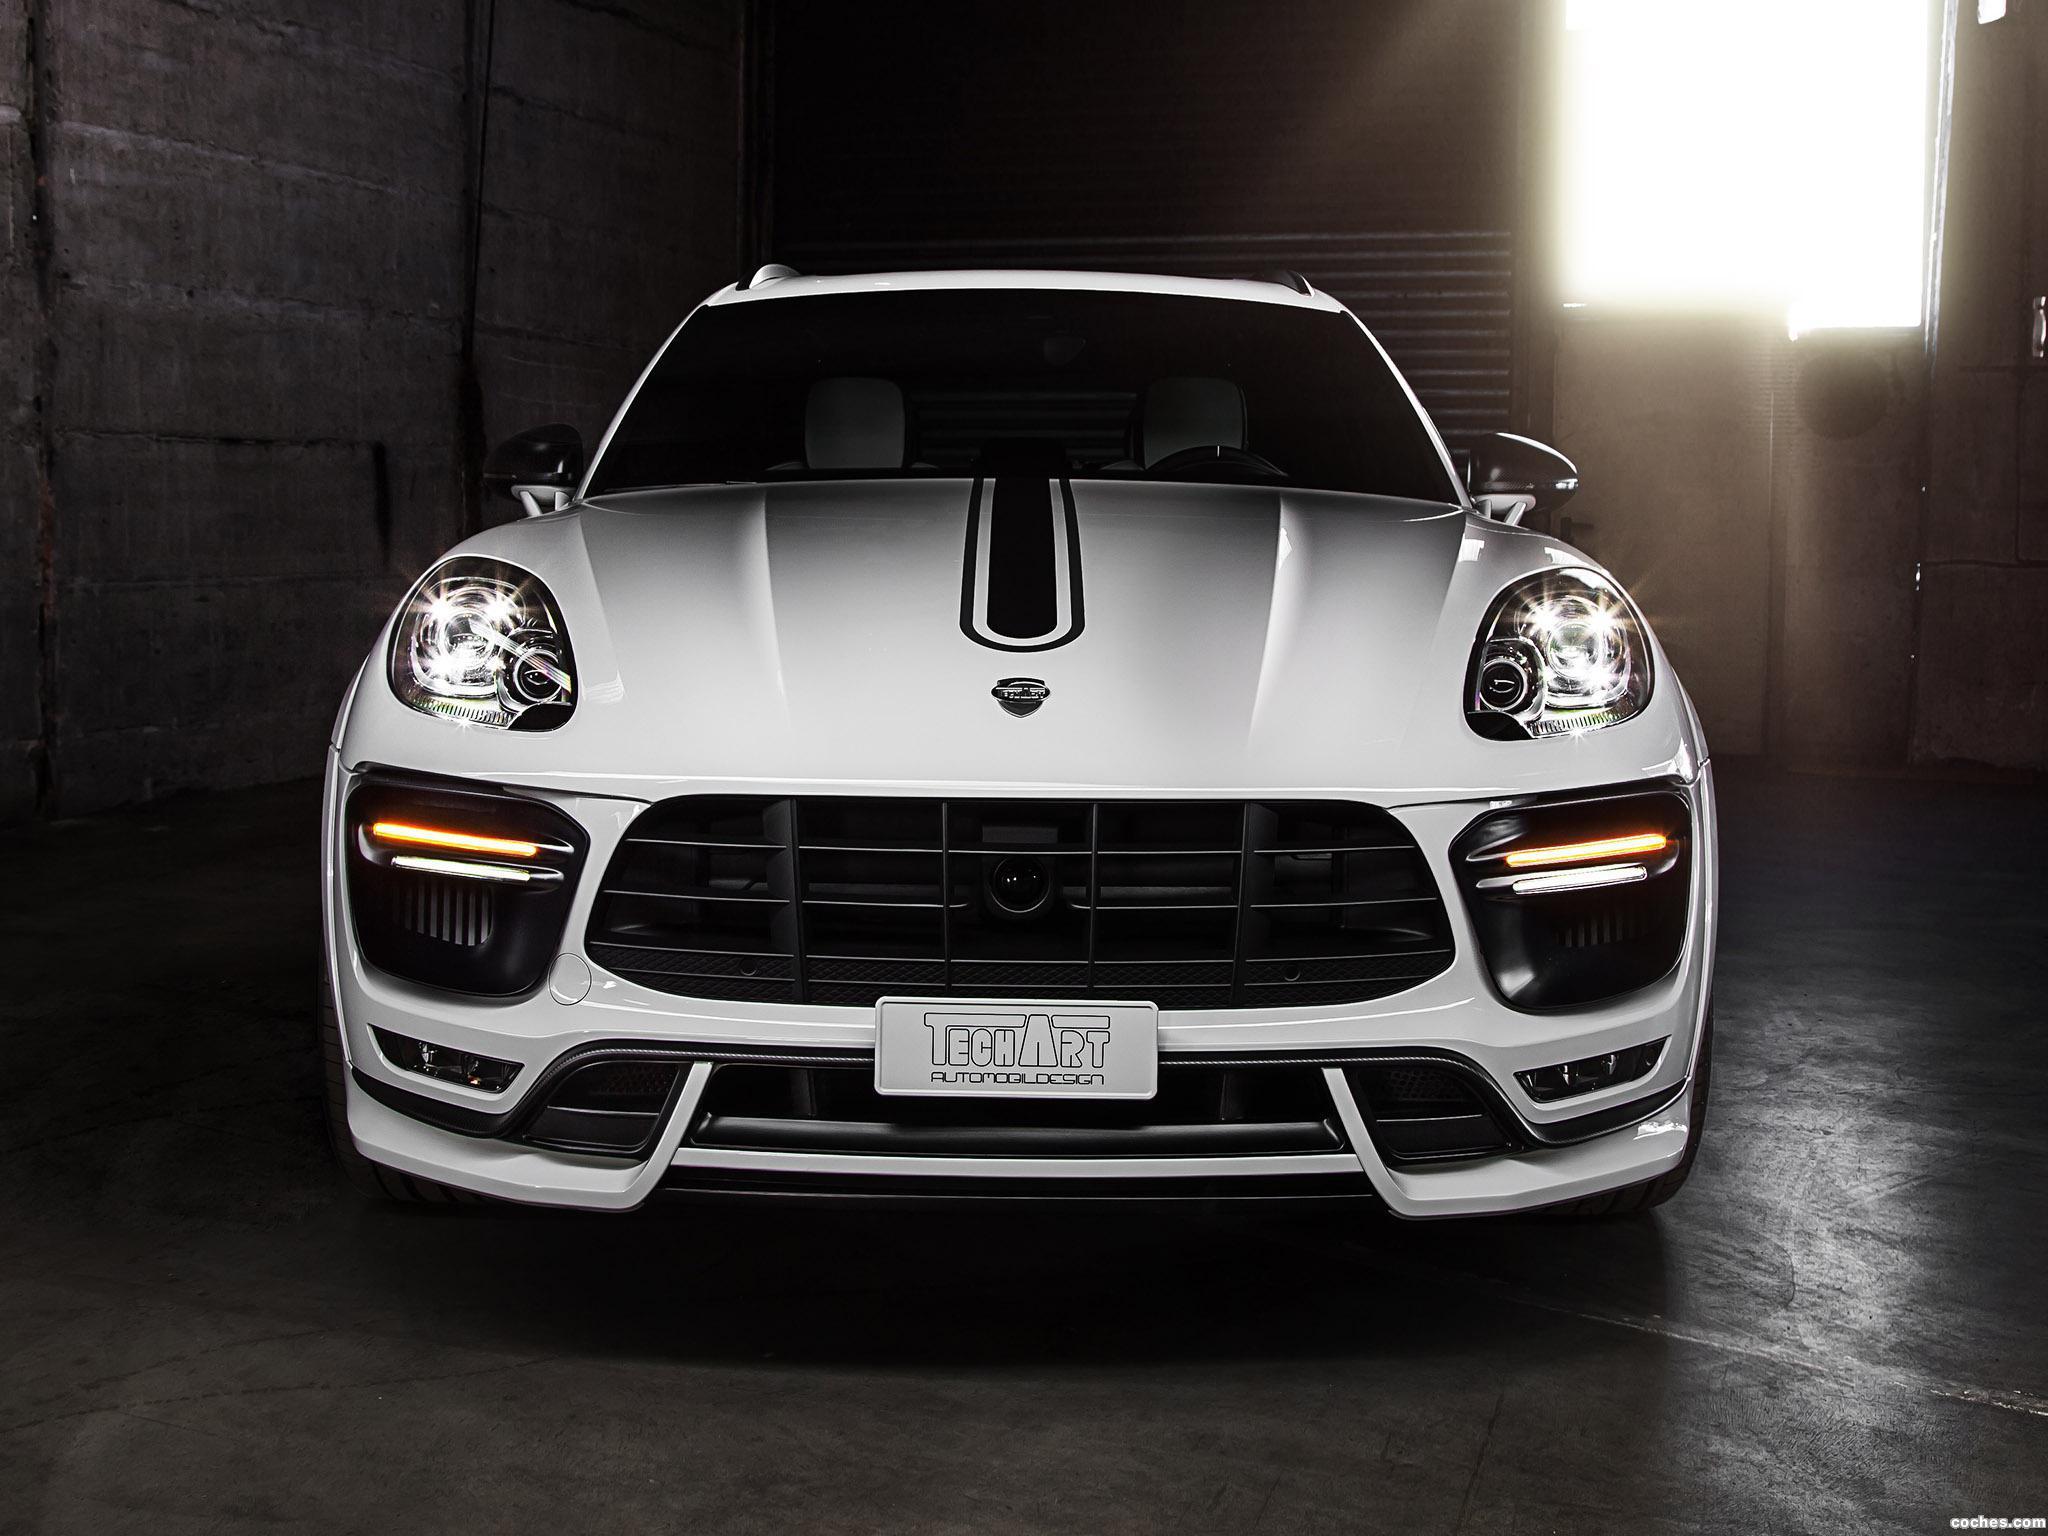 Foto 0 de Techart Porsche Macan 2015